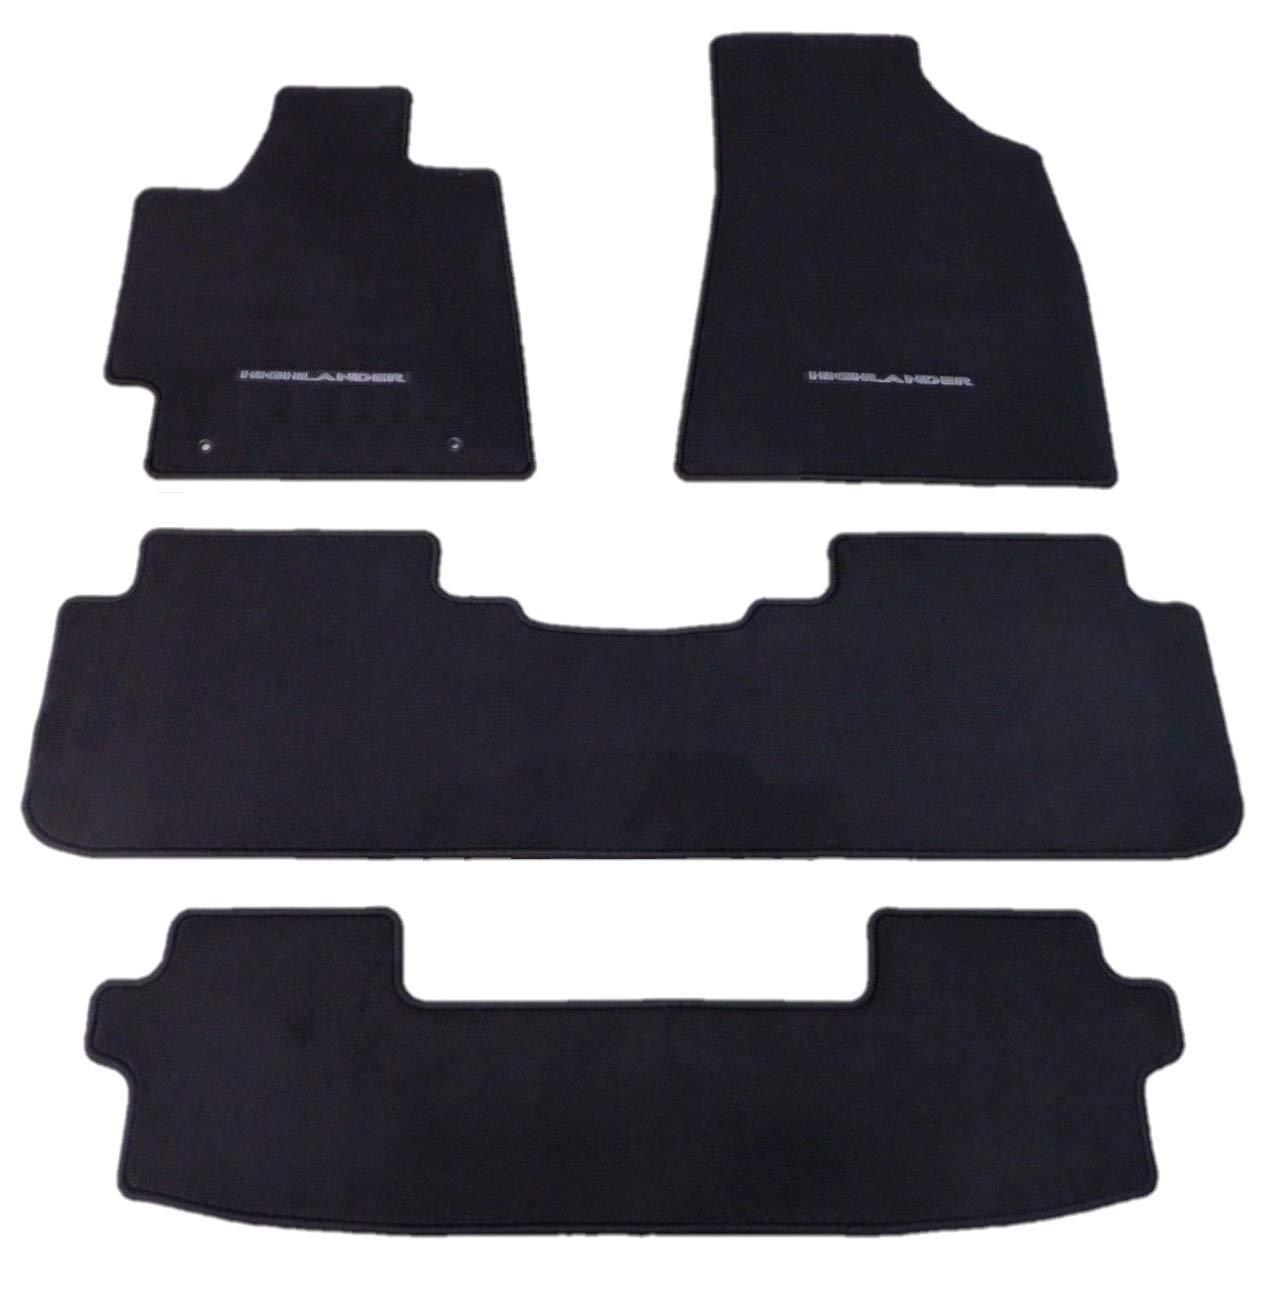 Smartliner 2008 2019 Toyota Sequoia Floor Mat Custom Liner: 2010 Toyota Highlander Carpet Floor Mats